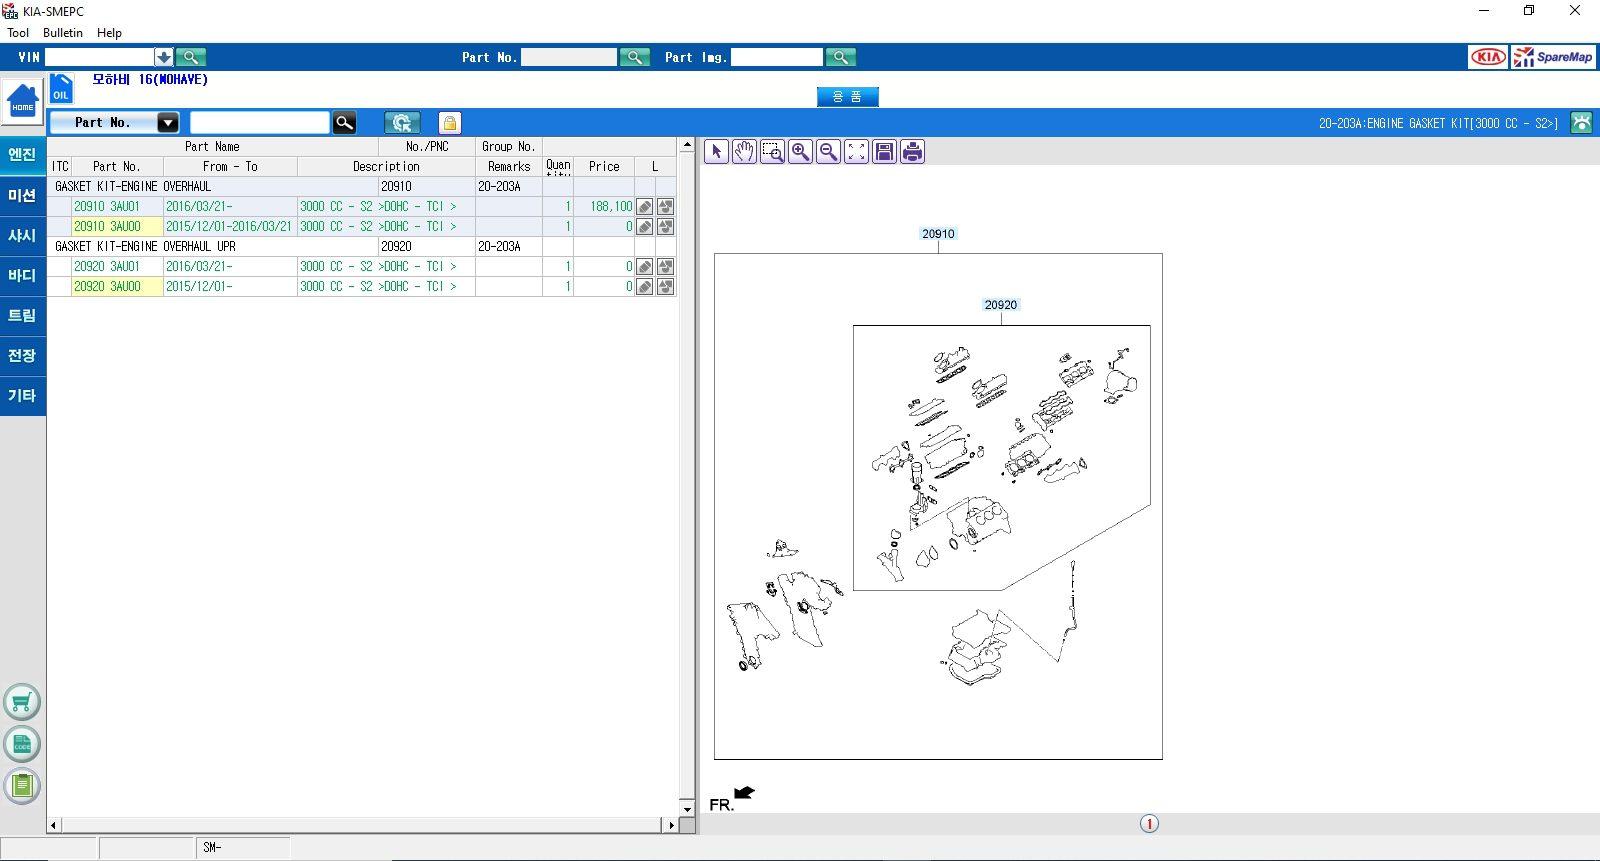 Hyundai_Kia_Korea_SM_EPC_072019_Parts_Catalog_Domestic_Market_3